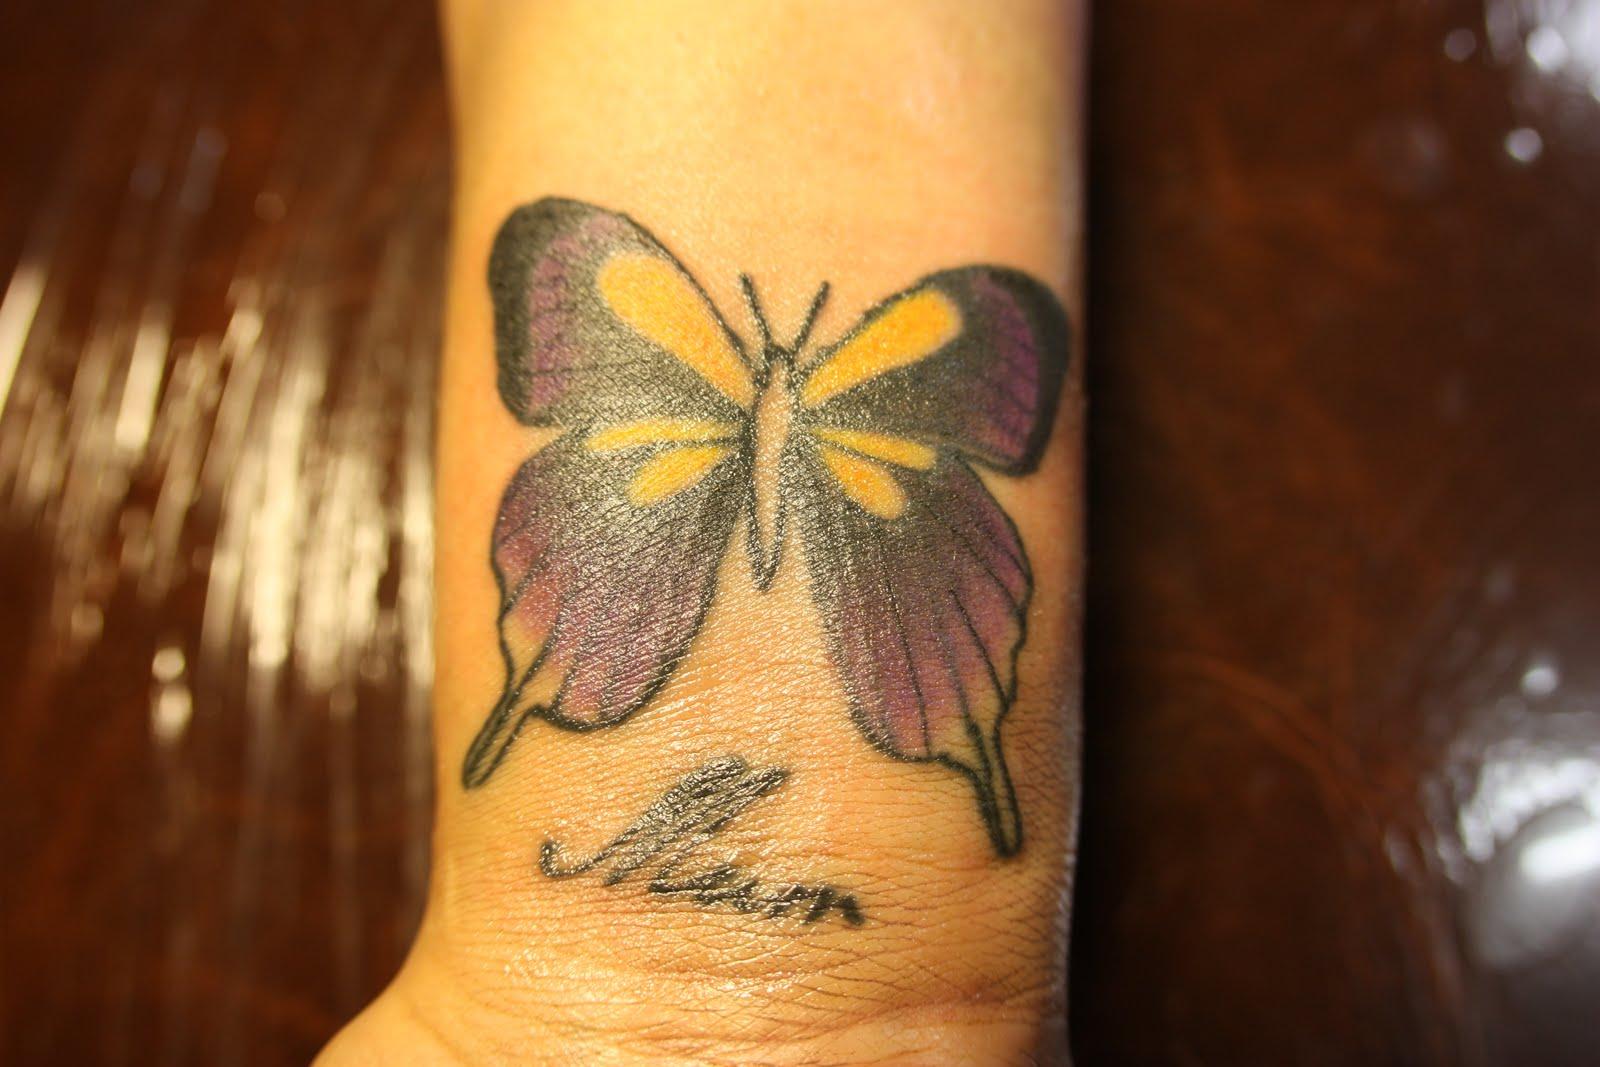 Tattoo: Pocket Watch with